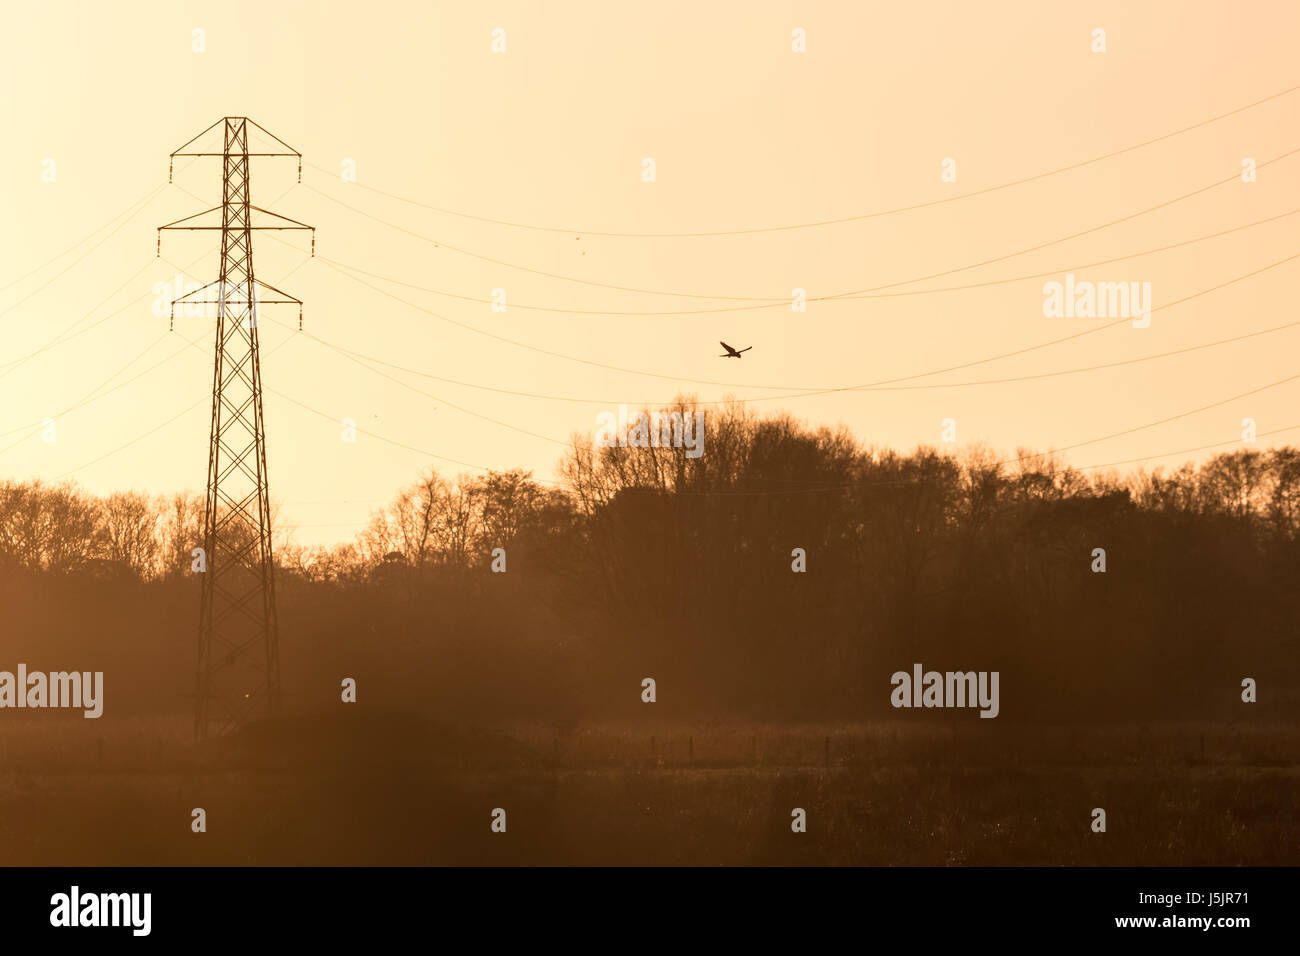 Silhouette von einem Kestrel Falcon Raptor (Falco Tinnunculus) Jagd ...